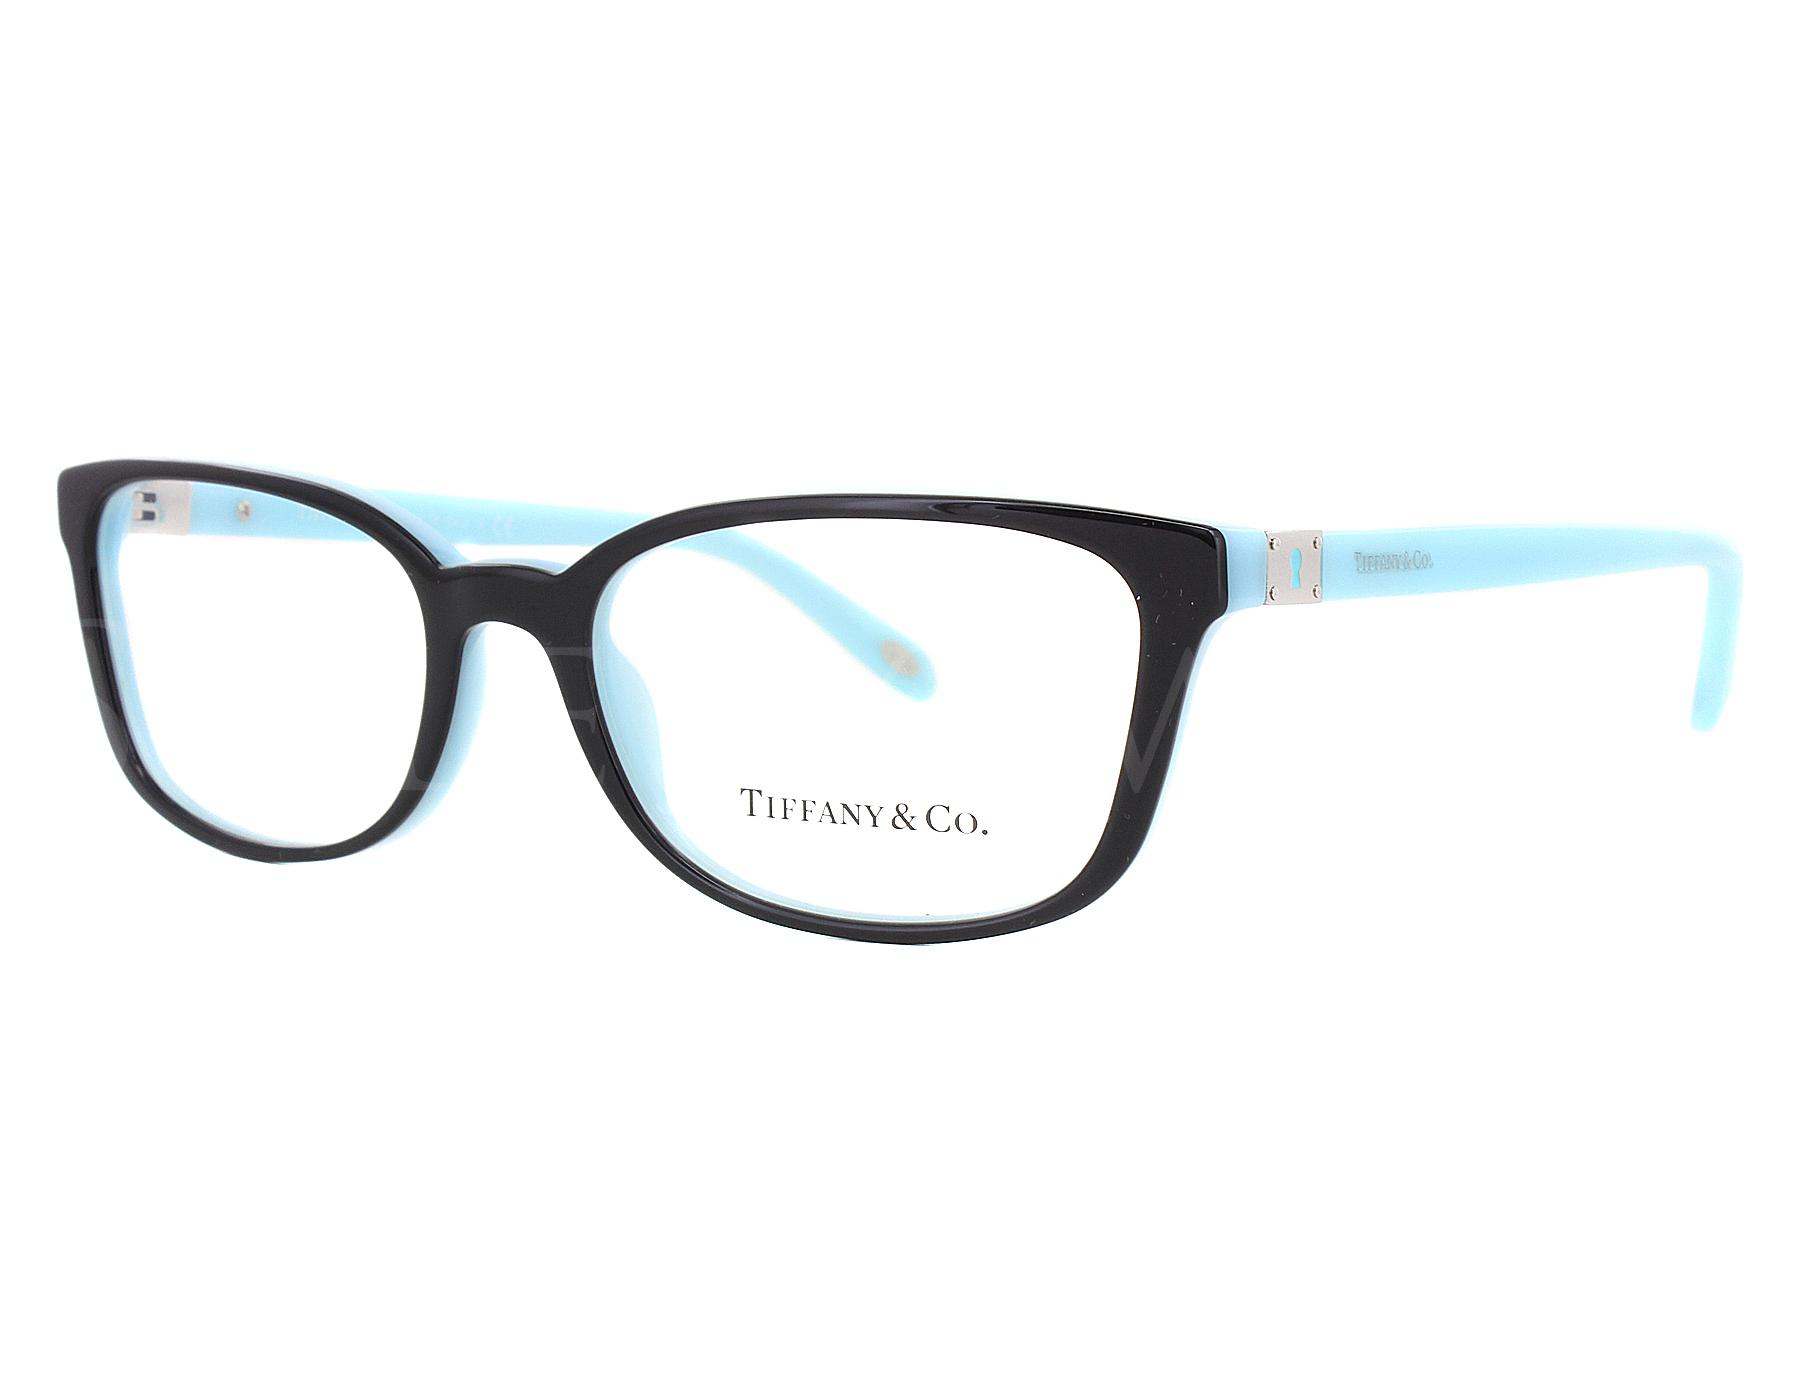 b89d5b12c202 New Tiffany Tf2094 8055 52mm Black Blue Optical Eyeglasses Frames